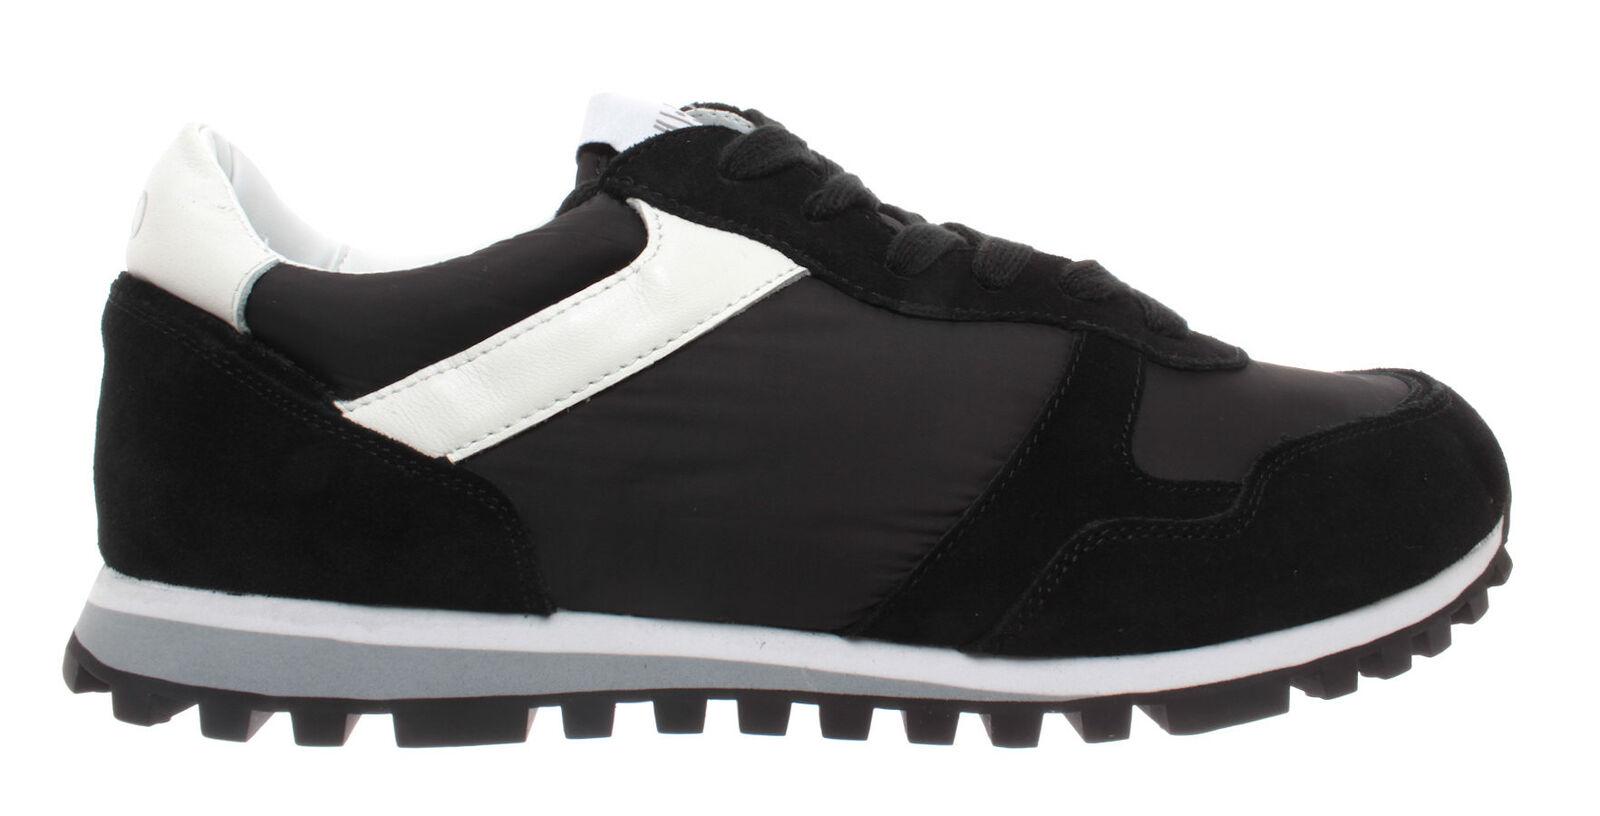 shoes men Sneakers LIU JO Milano Alex Running Black black Nouveau